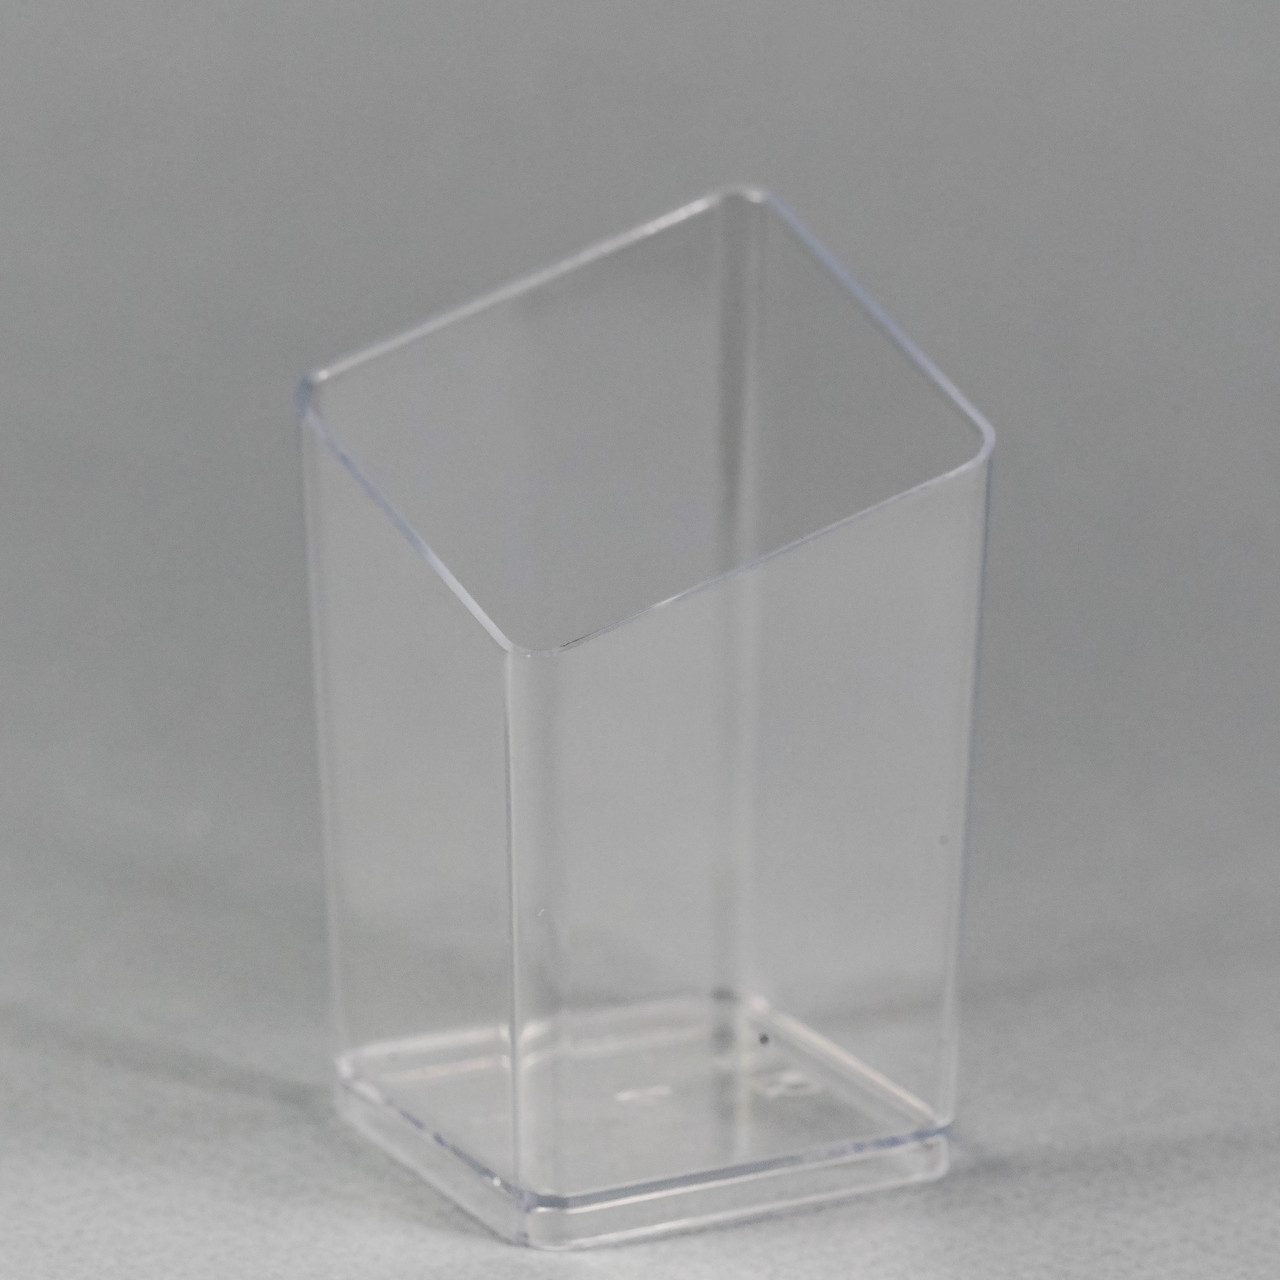 "Пиала-форма фуршетная квадратная 50 мл., 4х4х6,7 см., 10 шт/уп стеклоподобная, прозрачная ""Призма"""